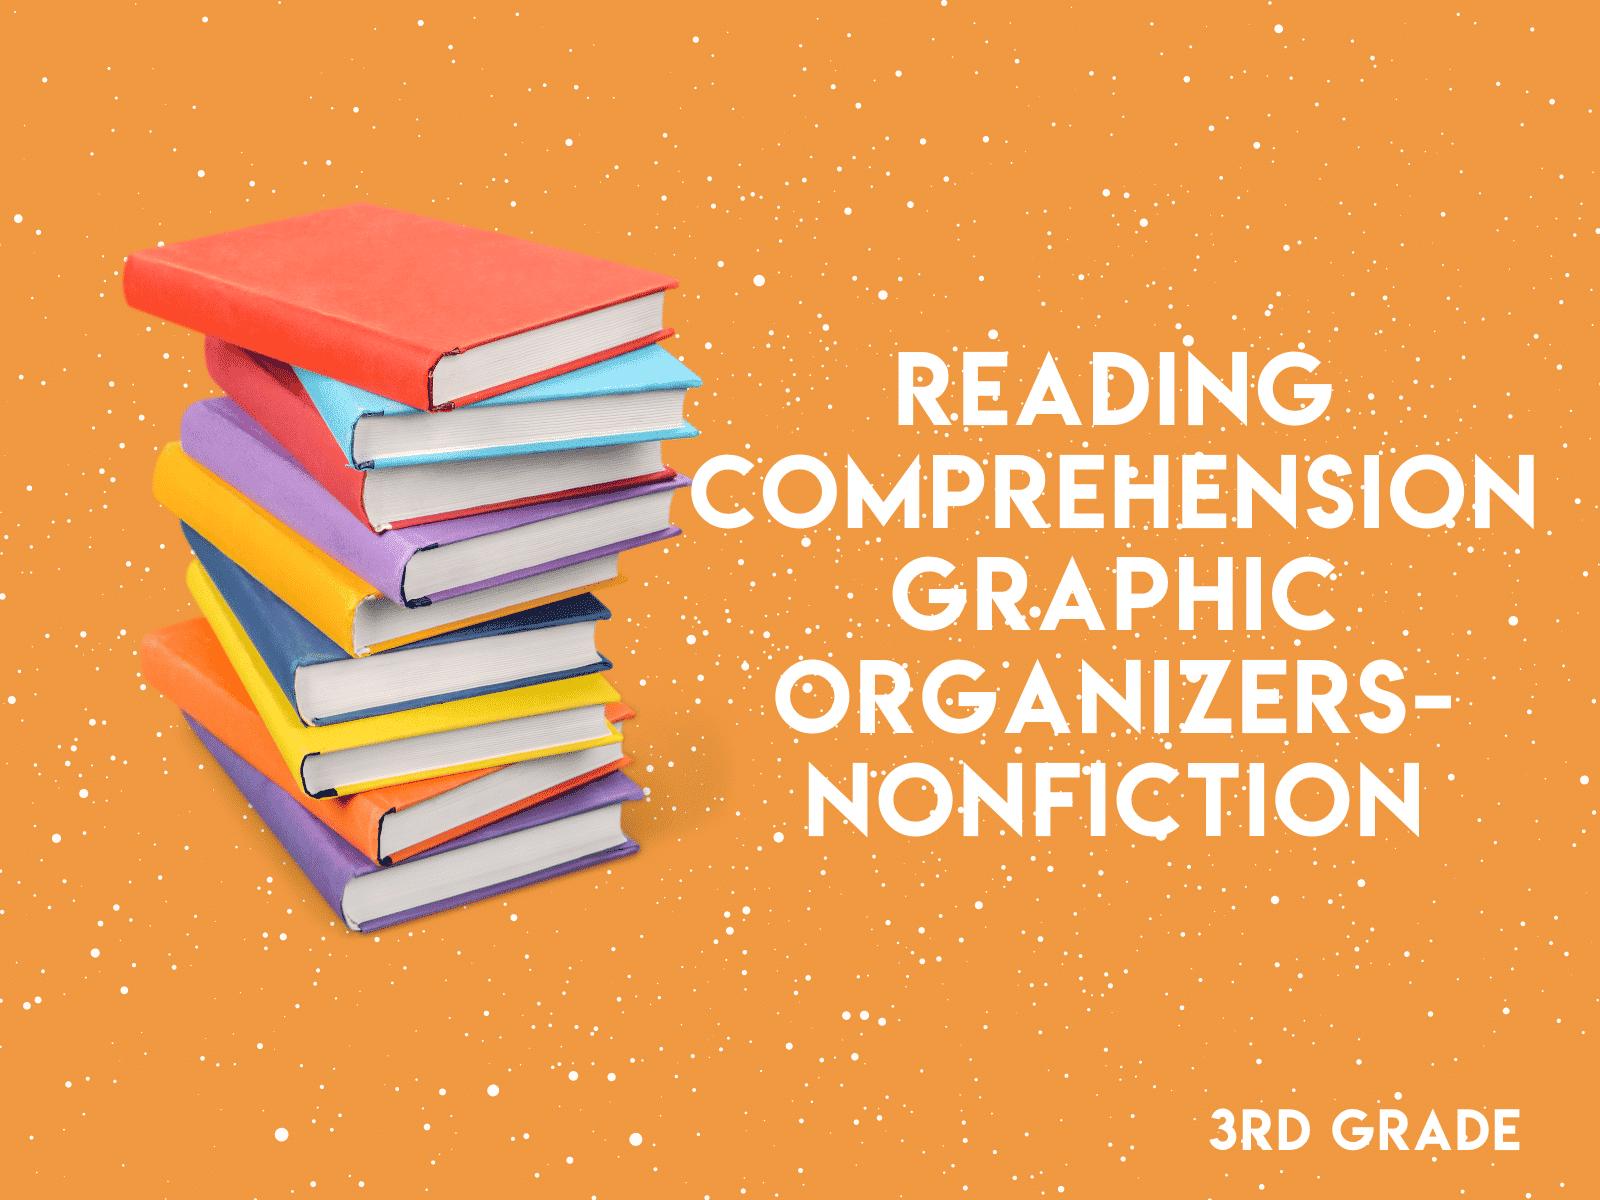 3rd Grade Non-Fiction Reading Graphic Organizer